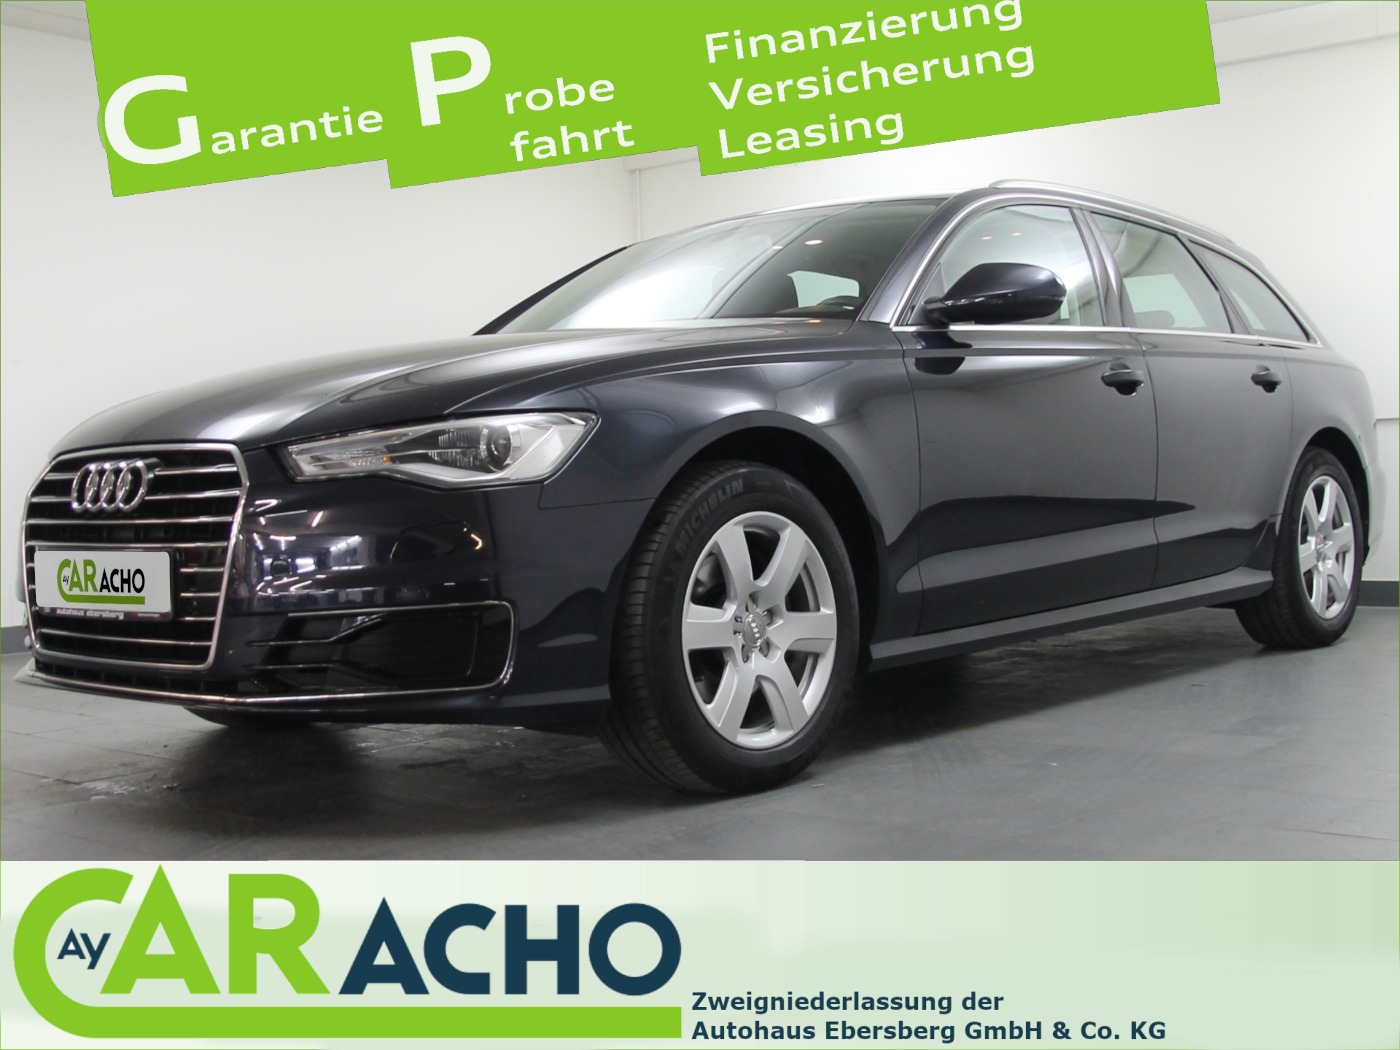 Audi A6 Avant 2.0 TDI Xenon Navi Rückfahrkamera, Jahr 2017, Diesel